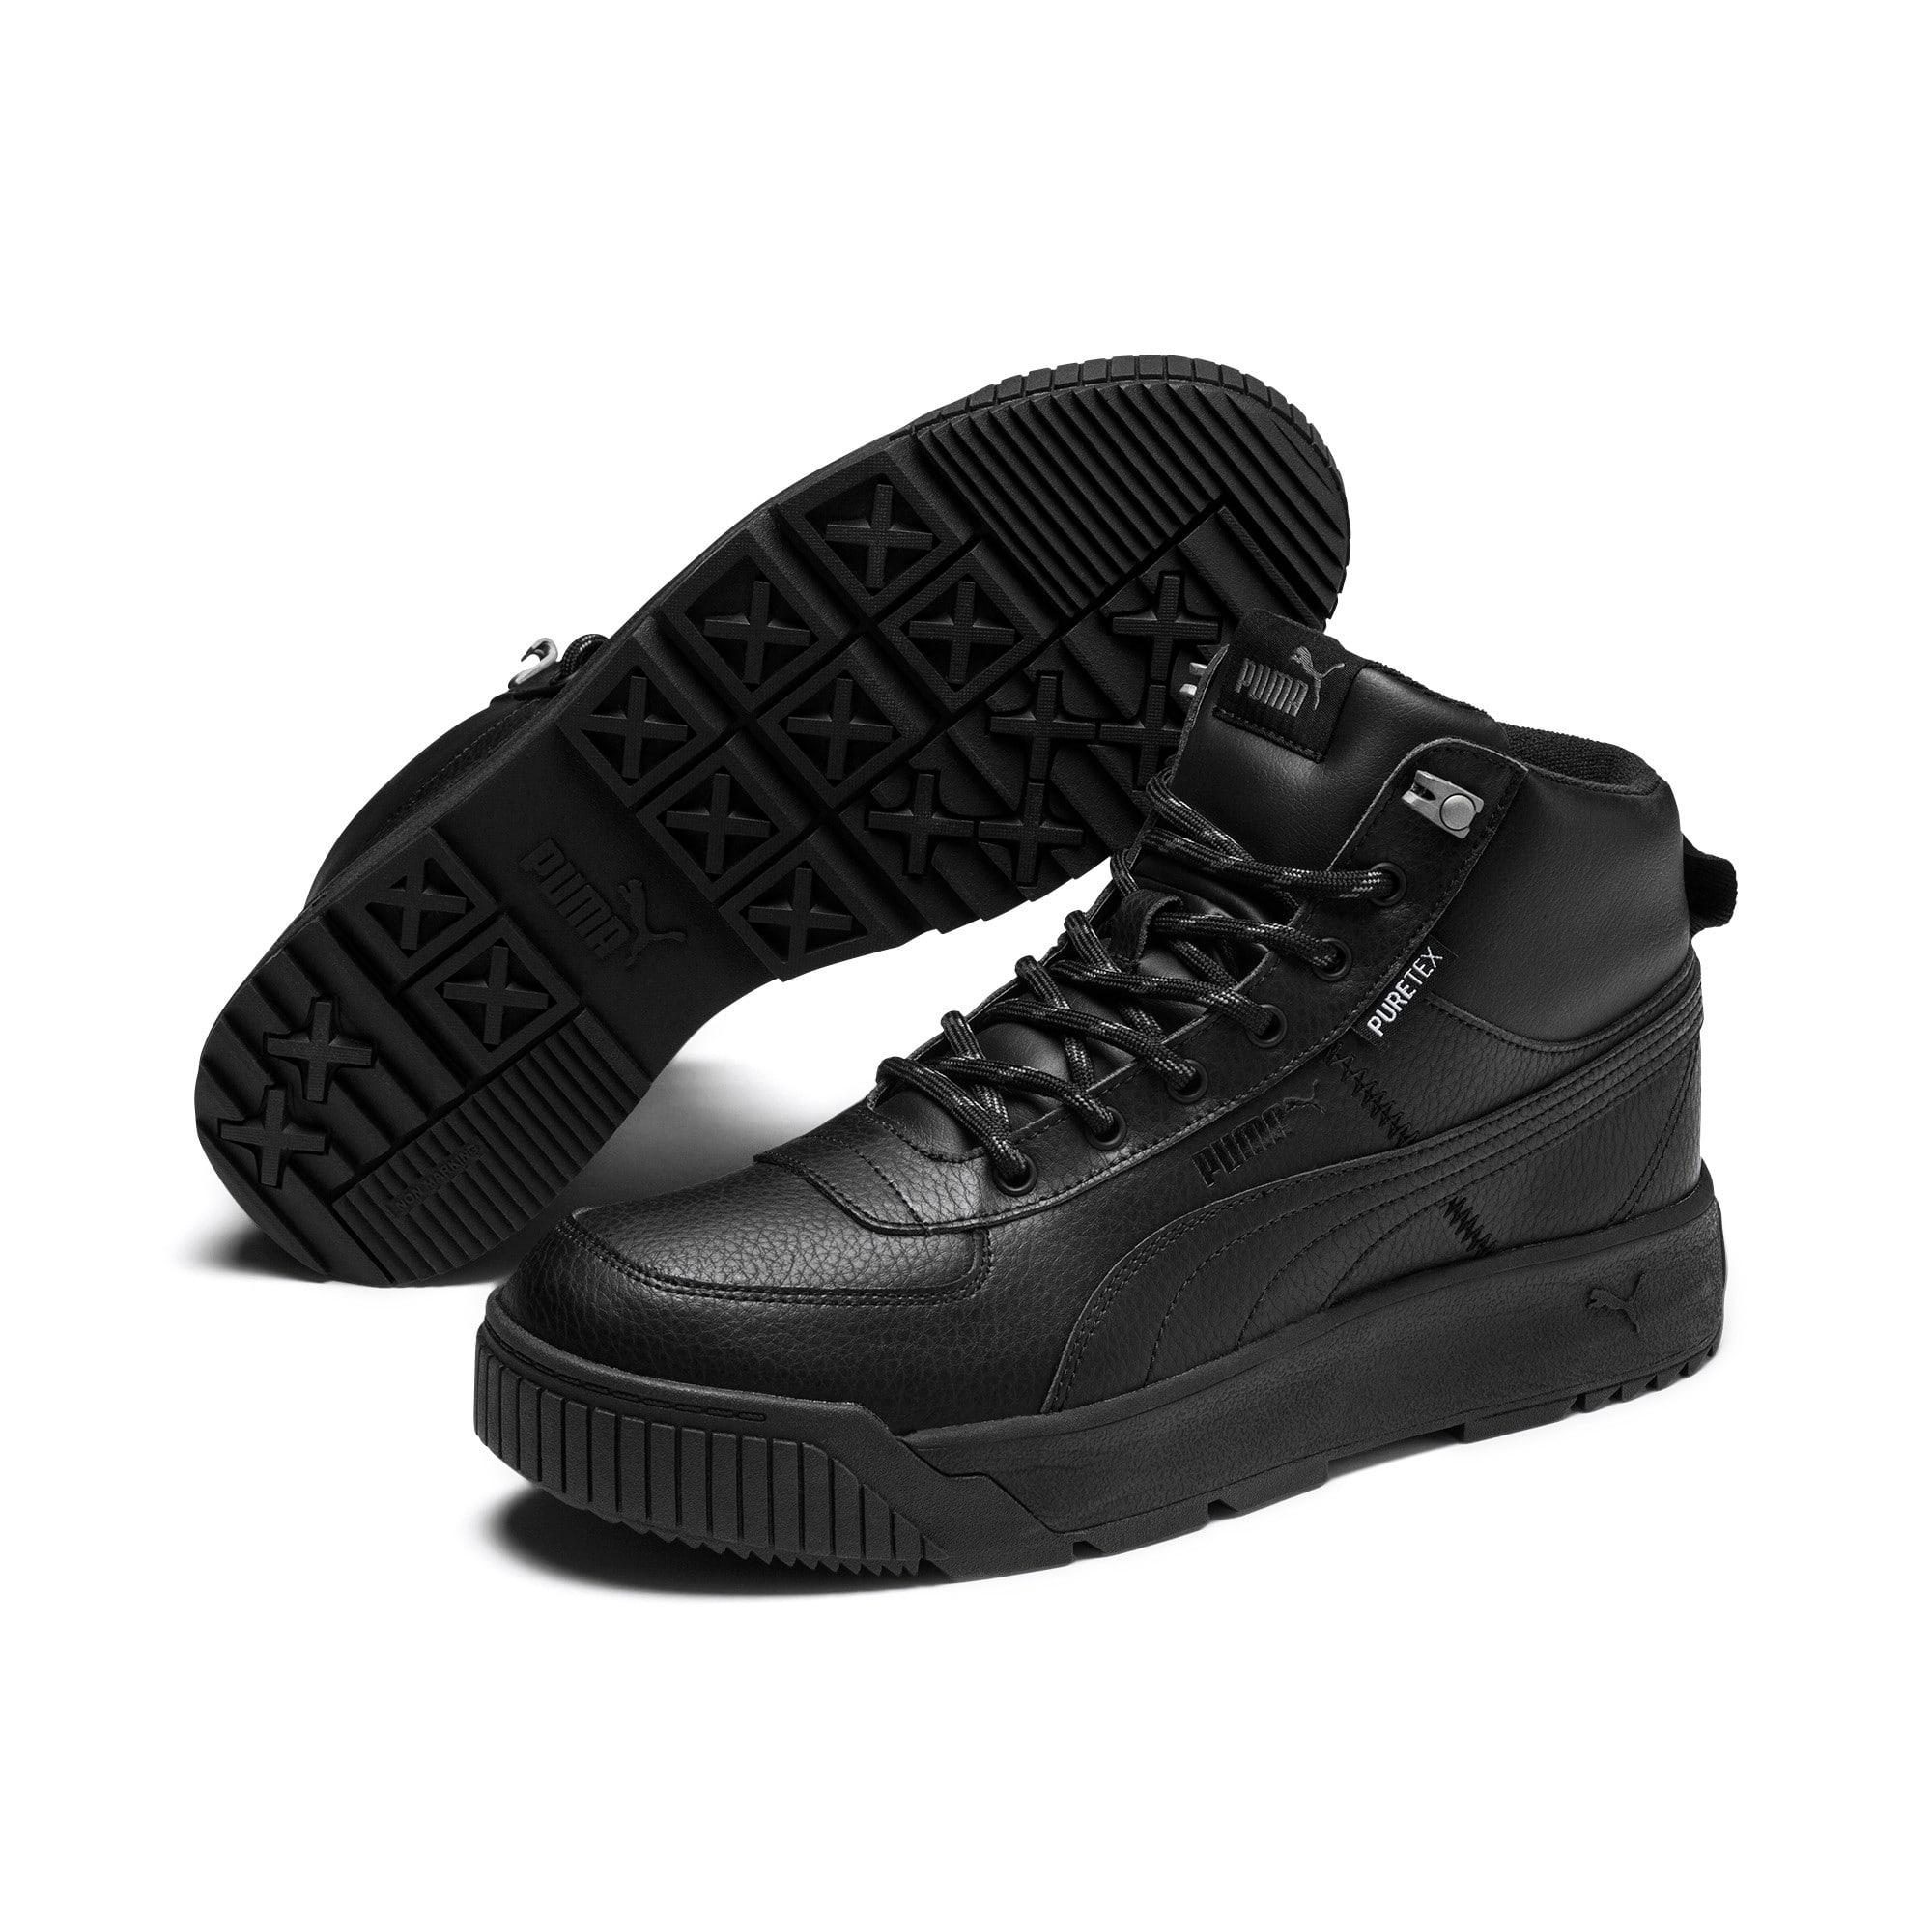 Thumbnail 3 of Tarrenz SB PURETEX Mid Sneakers, Puma Black-Puma Black, medium